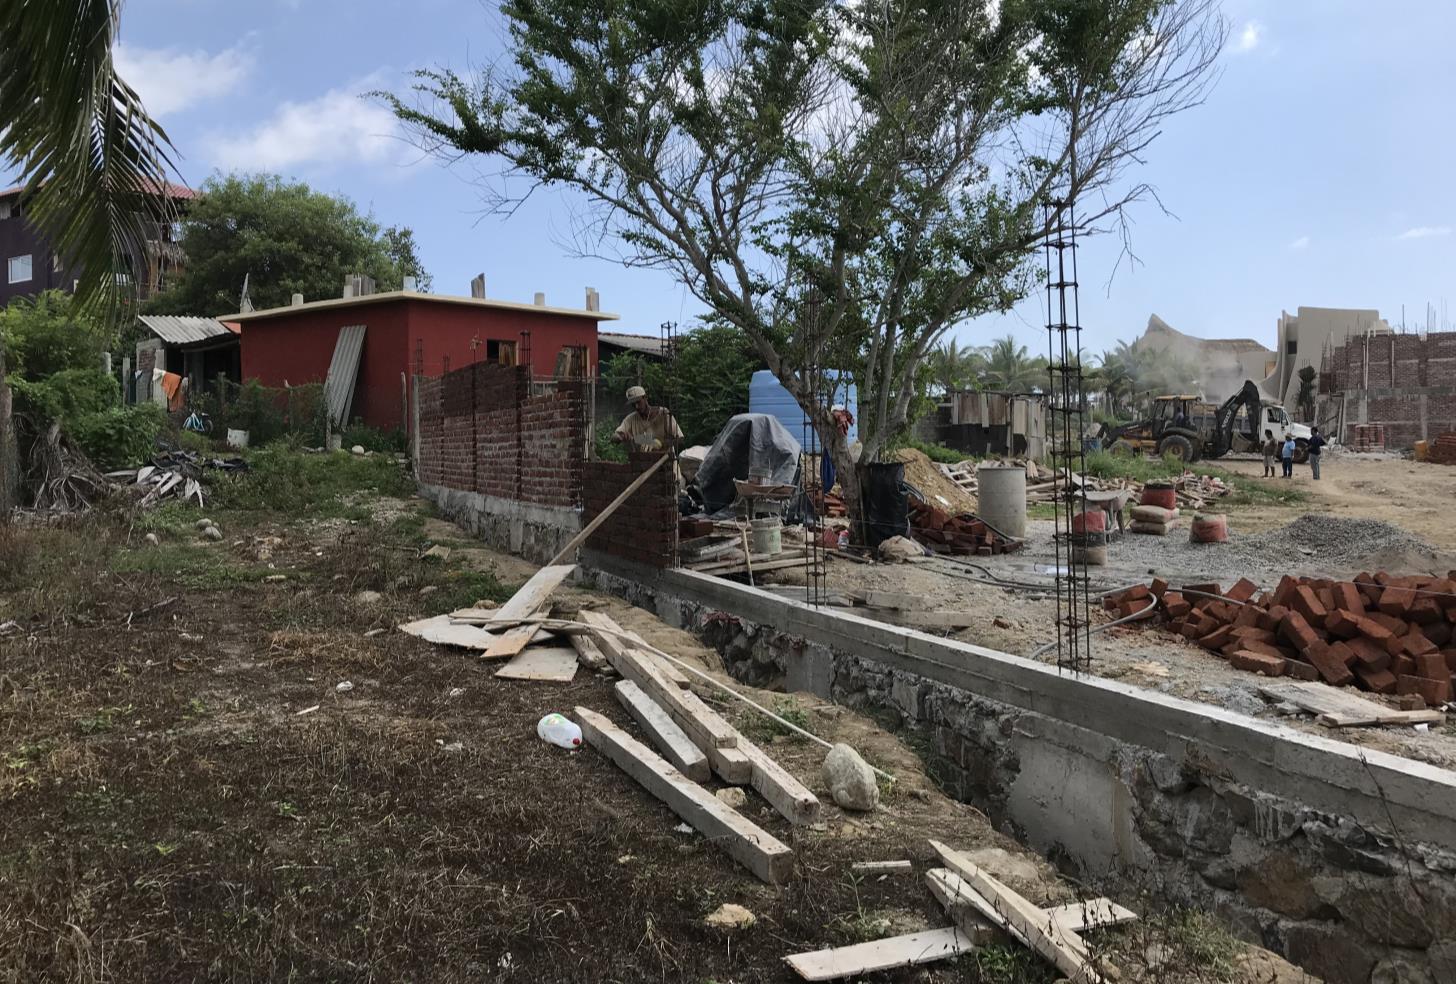 REPORTE-FOTOGRAFICO-PUNTA-MAJAHUA-12-DE-AGOSTO-DEL-2018-030.jpg